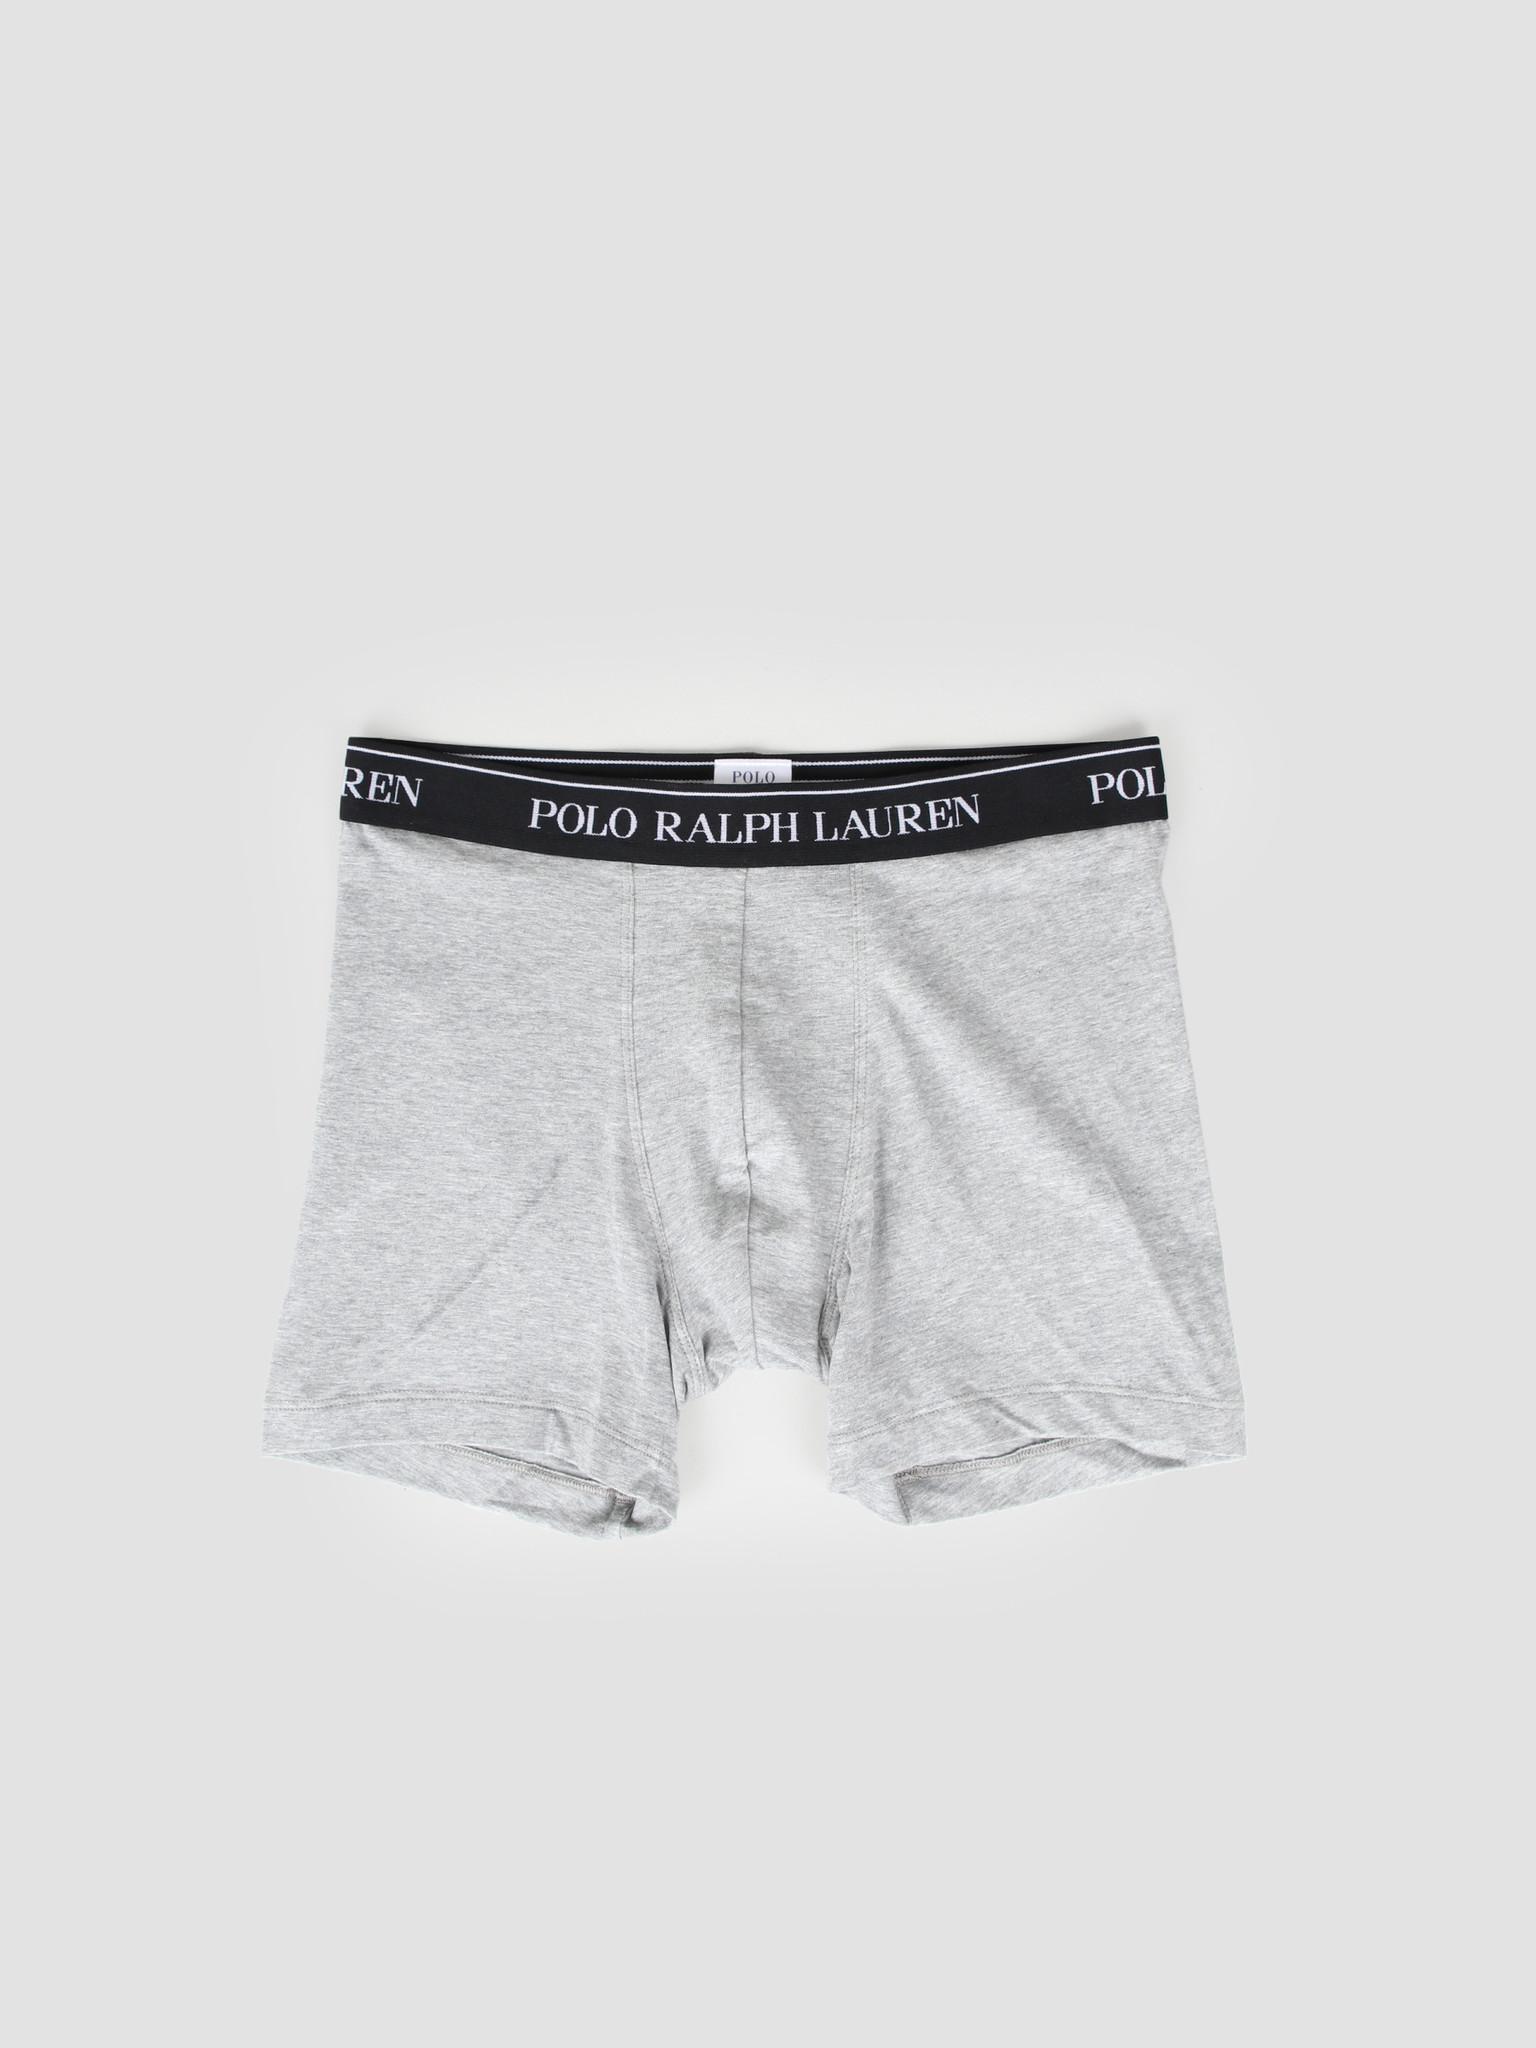 Polo Ralph Lauren Polo Ralph Lauren 3 Pack Boxer Brief Multi 714621874005